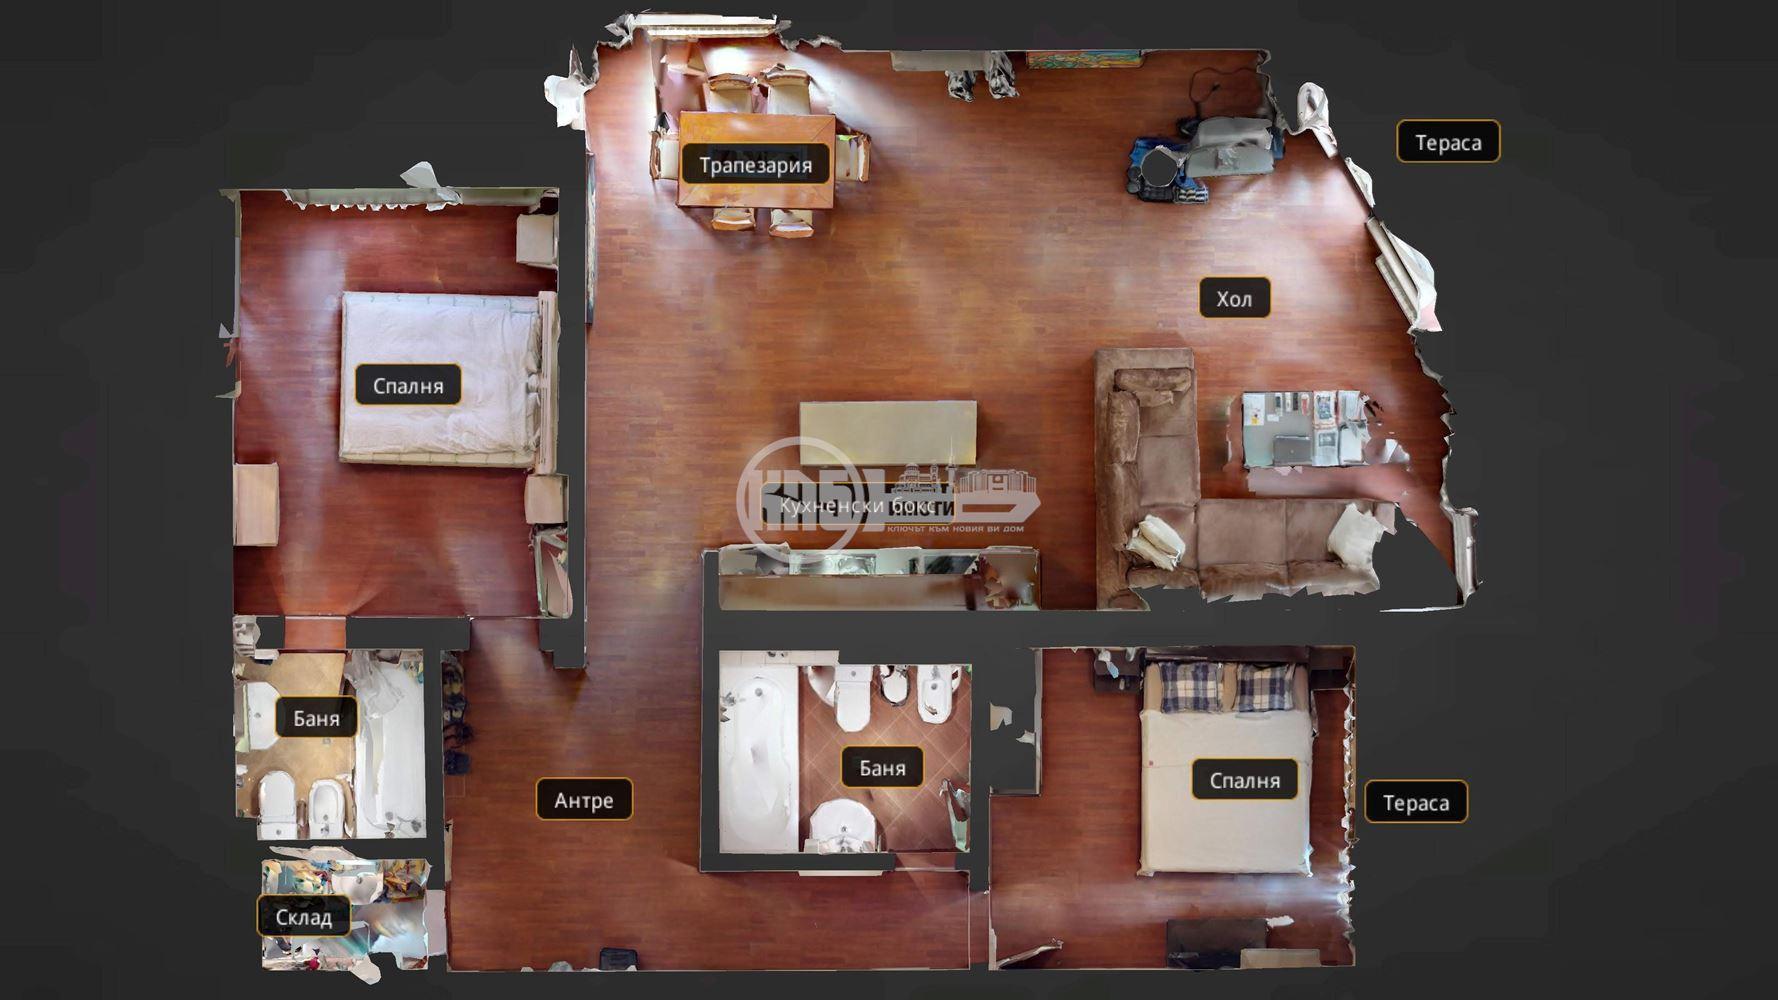 Перфектен тристаен апартамент - ремонтиран и без забележки